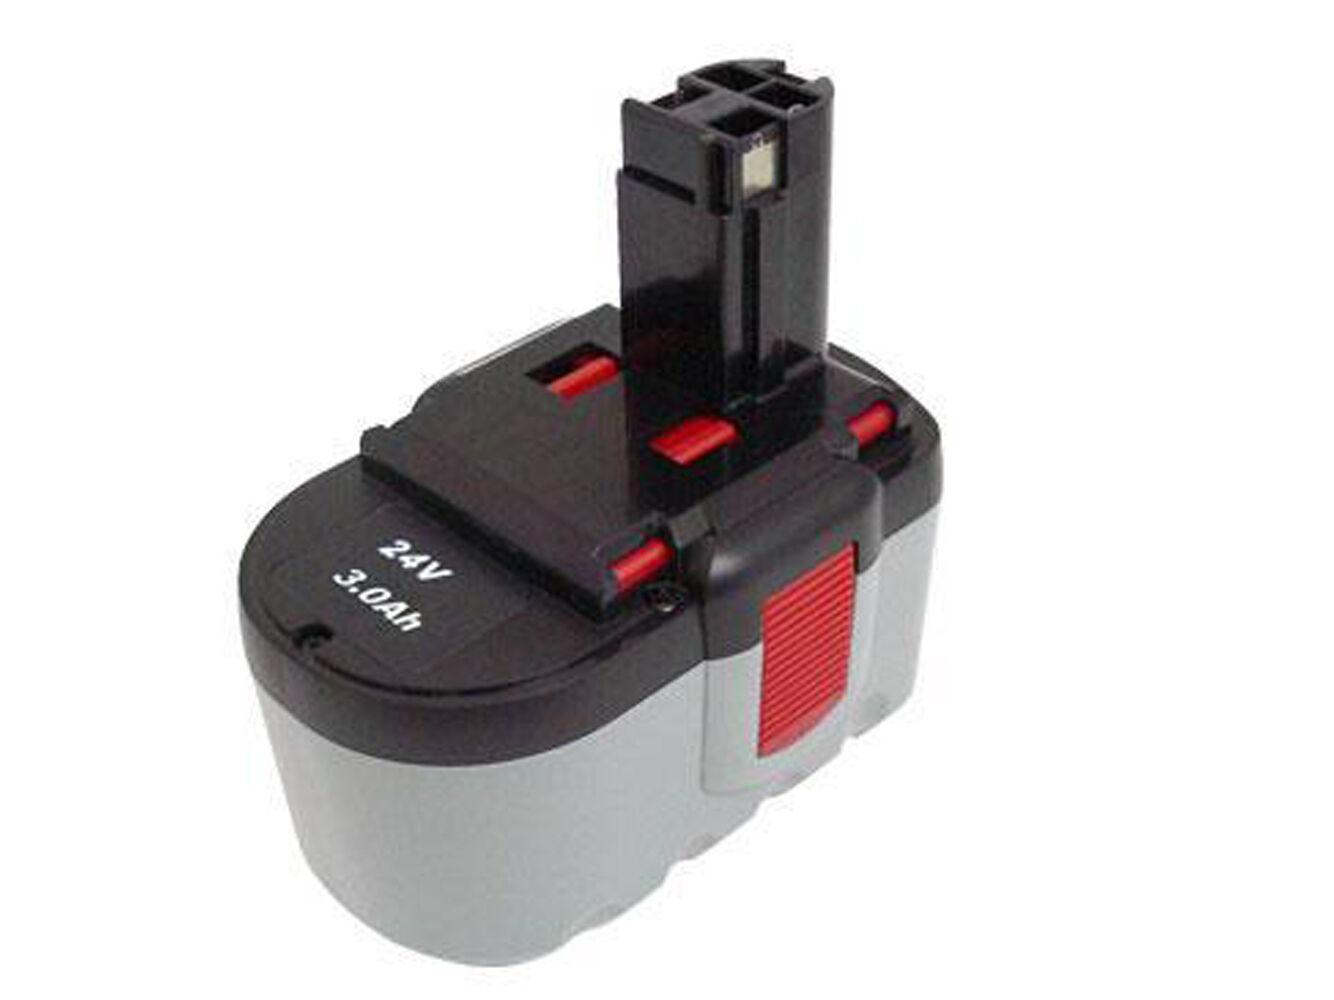 Akku für Bosch 2607335562, 2607335637, 2607335645, NiMH   24V   3000mAh